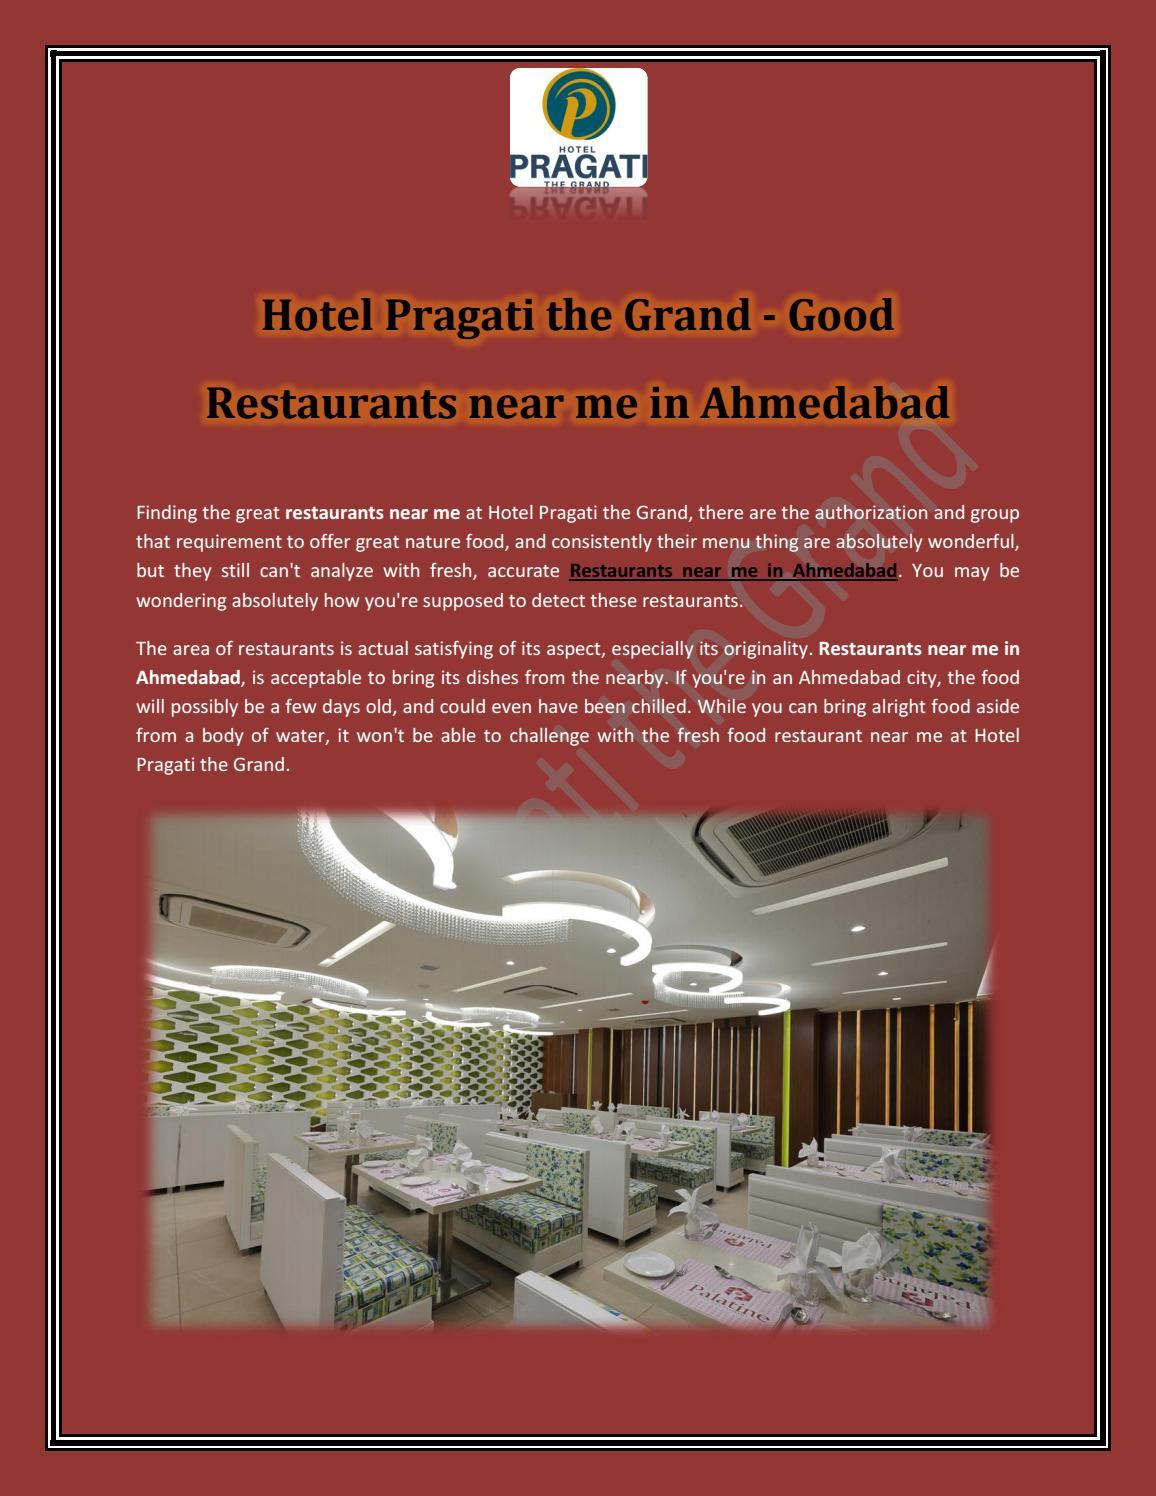 Hotel Pragati The Grand Good Restaurants Near Me In Ahmedabad By Hotelpragati Issuu